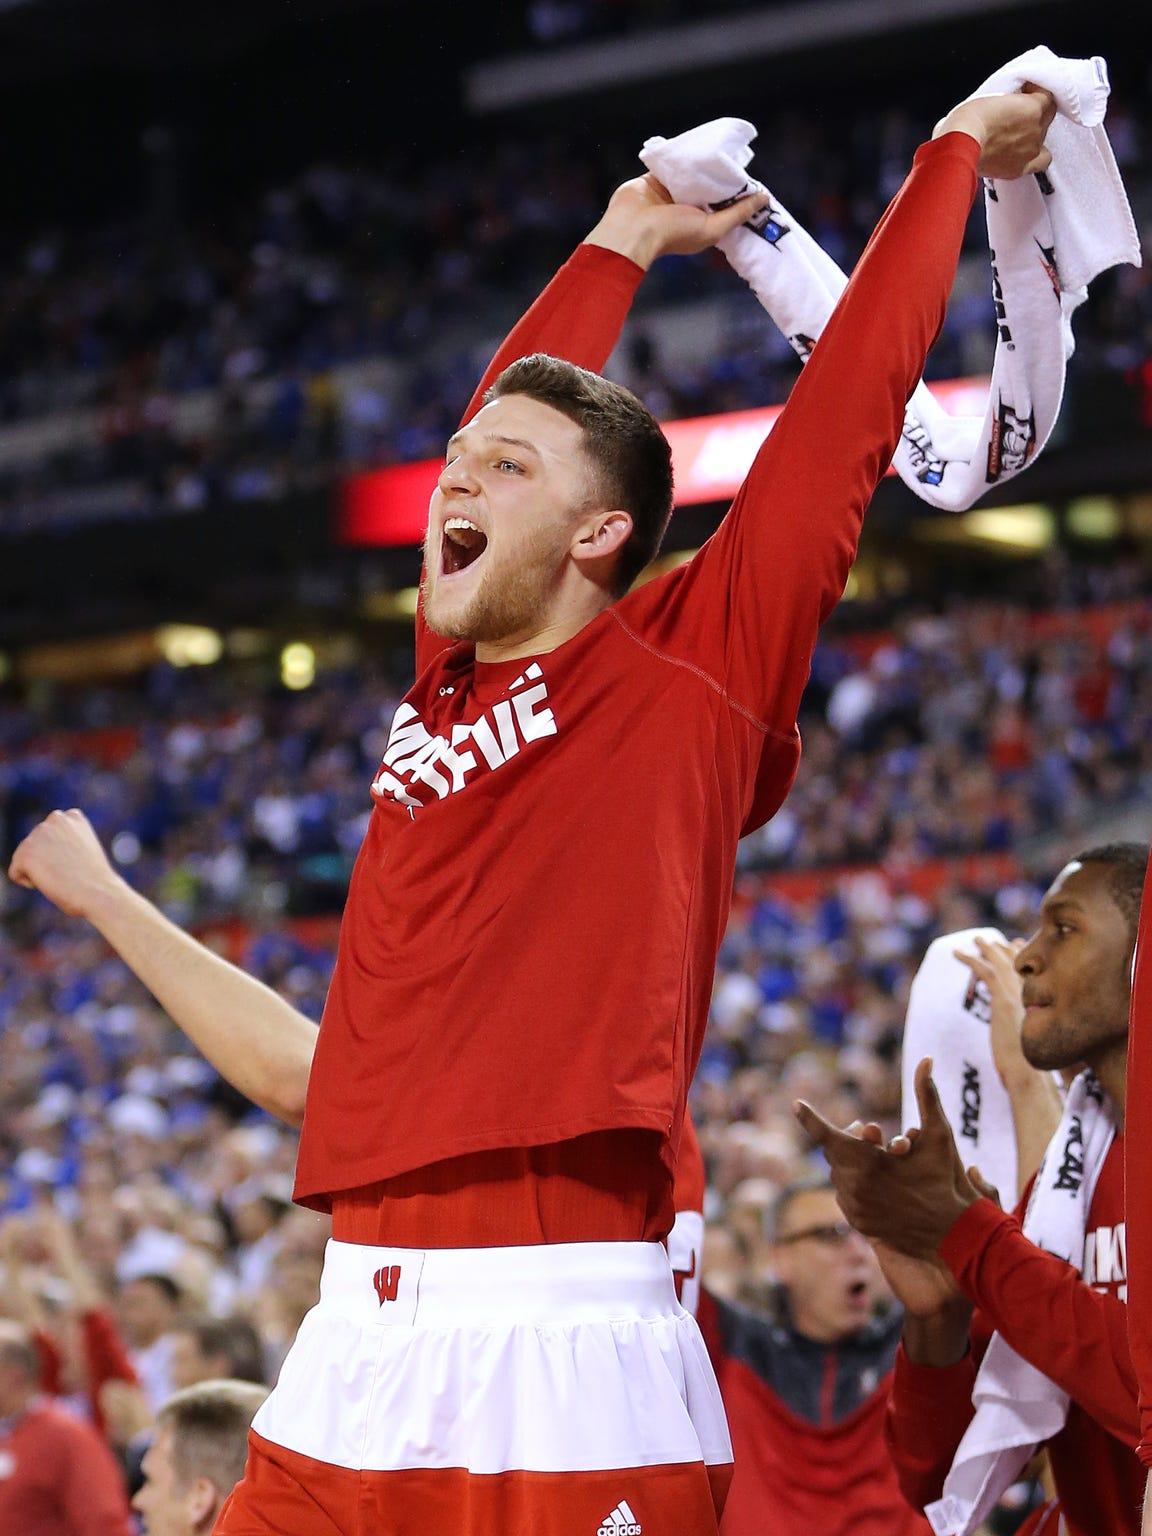 Wisconsin Badgers guard Zak Showalter celebrates a